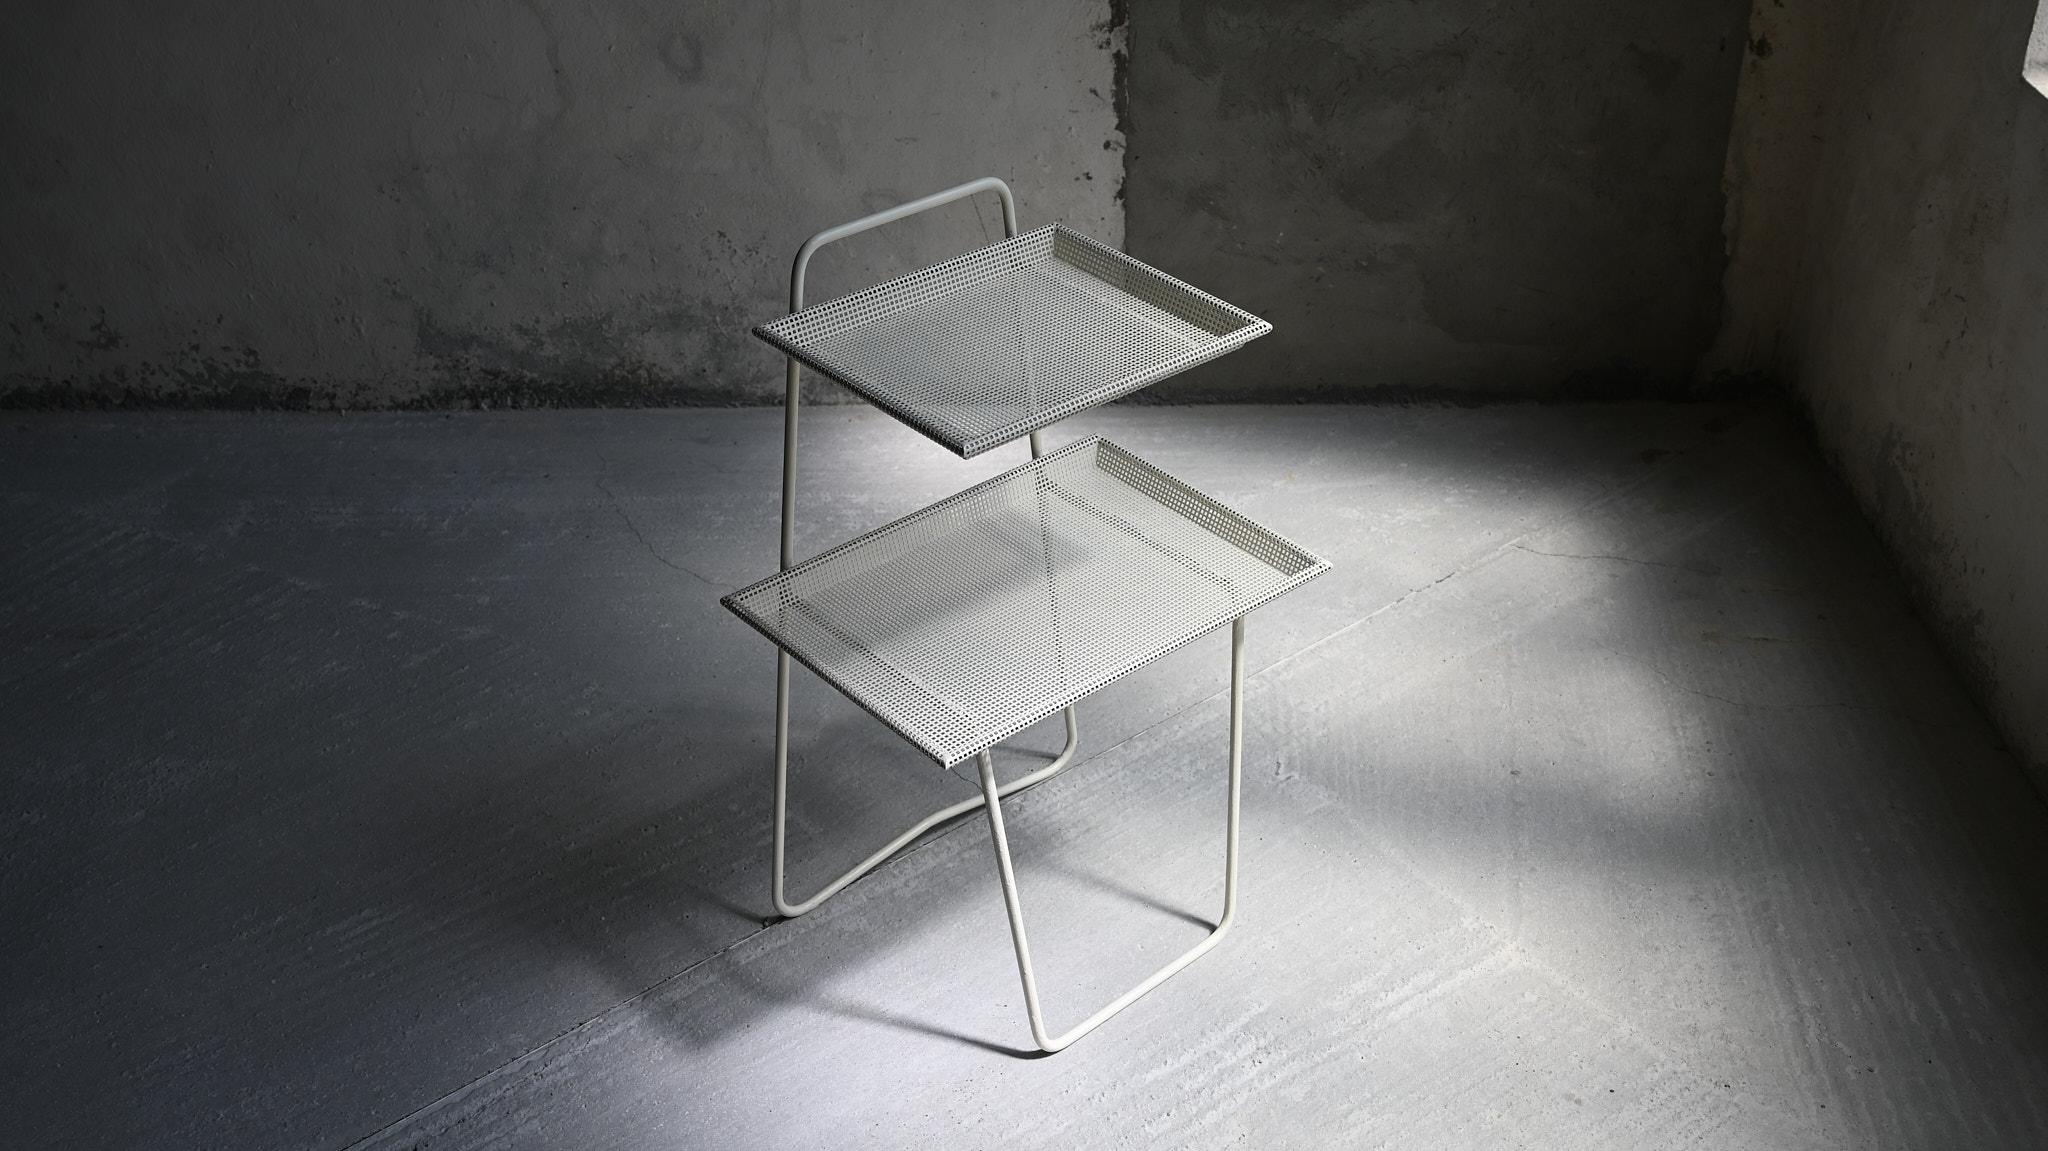 mathieu mategot phone table téléphone atelier mategot perforated metal perfore mid century modern moderniste modernism french design francais